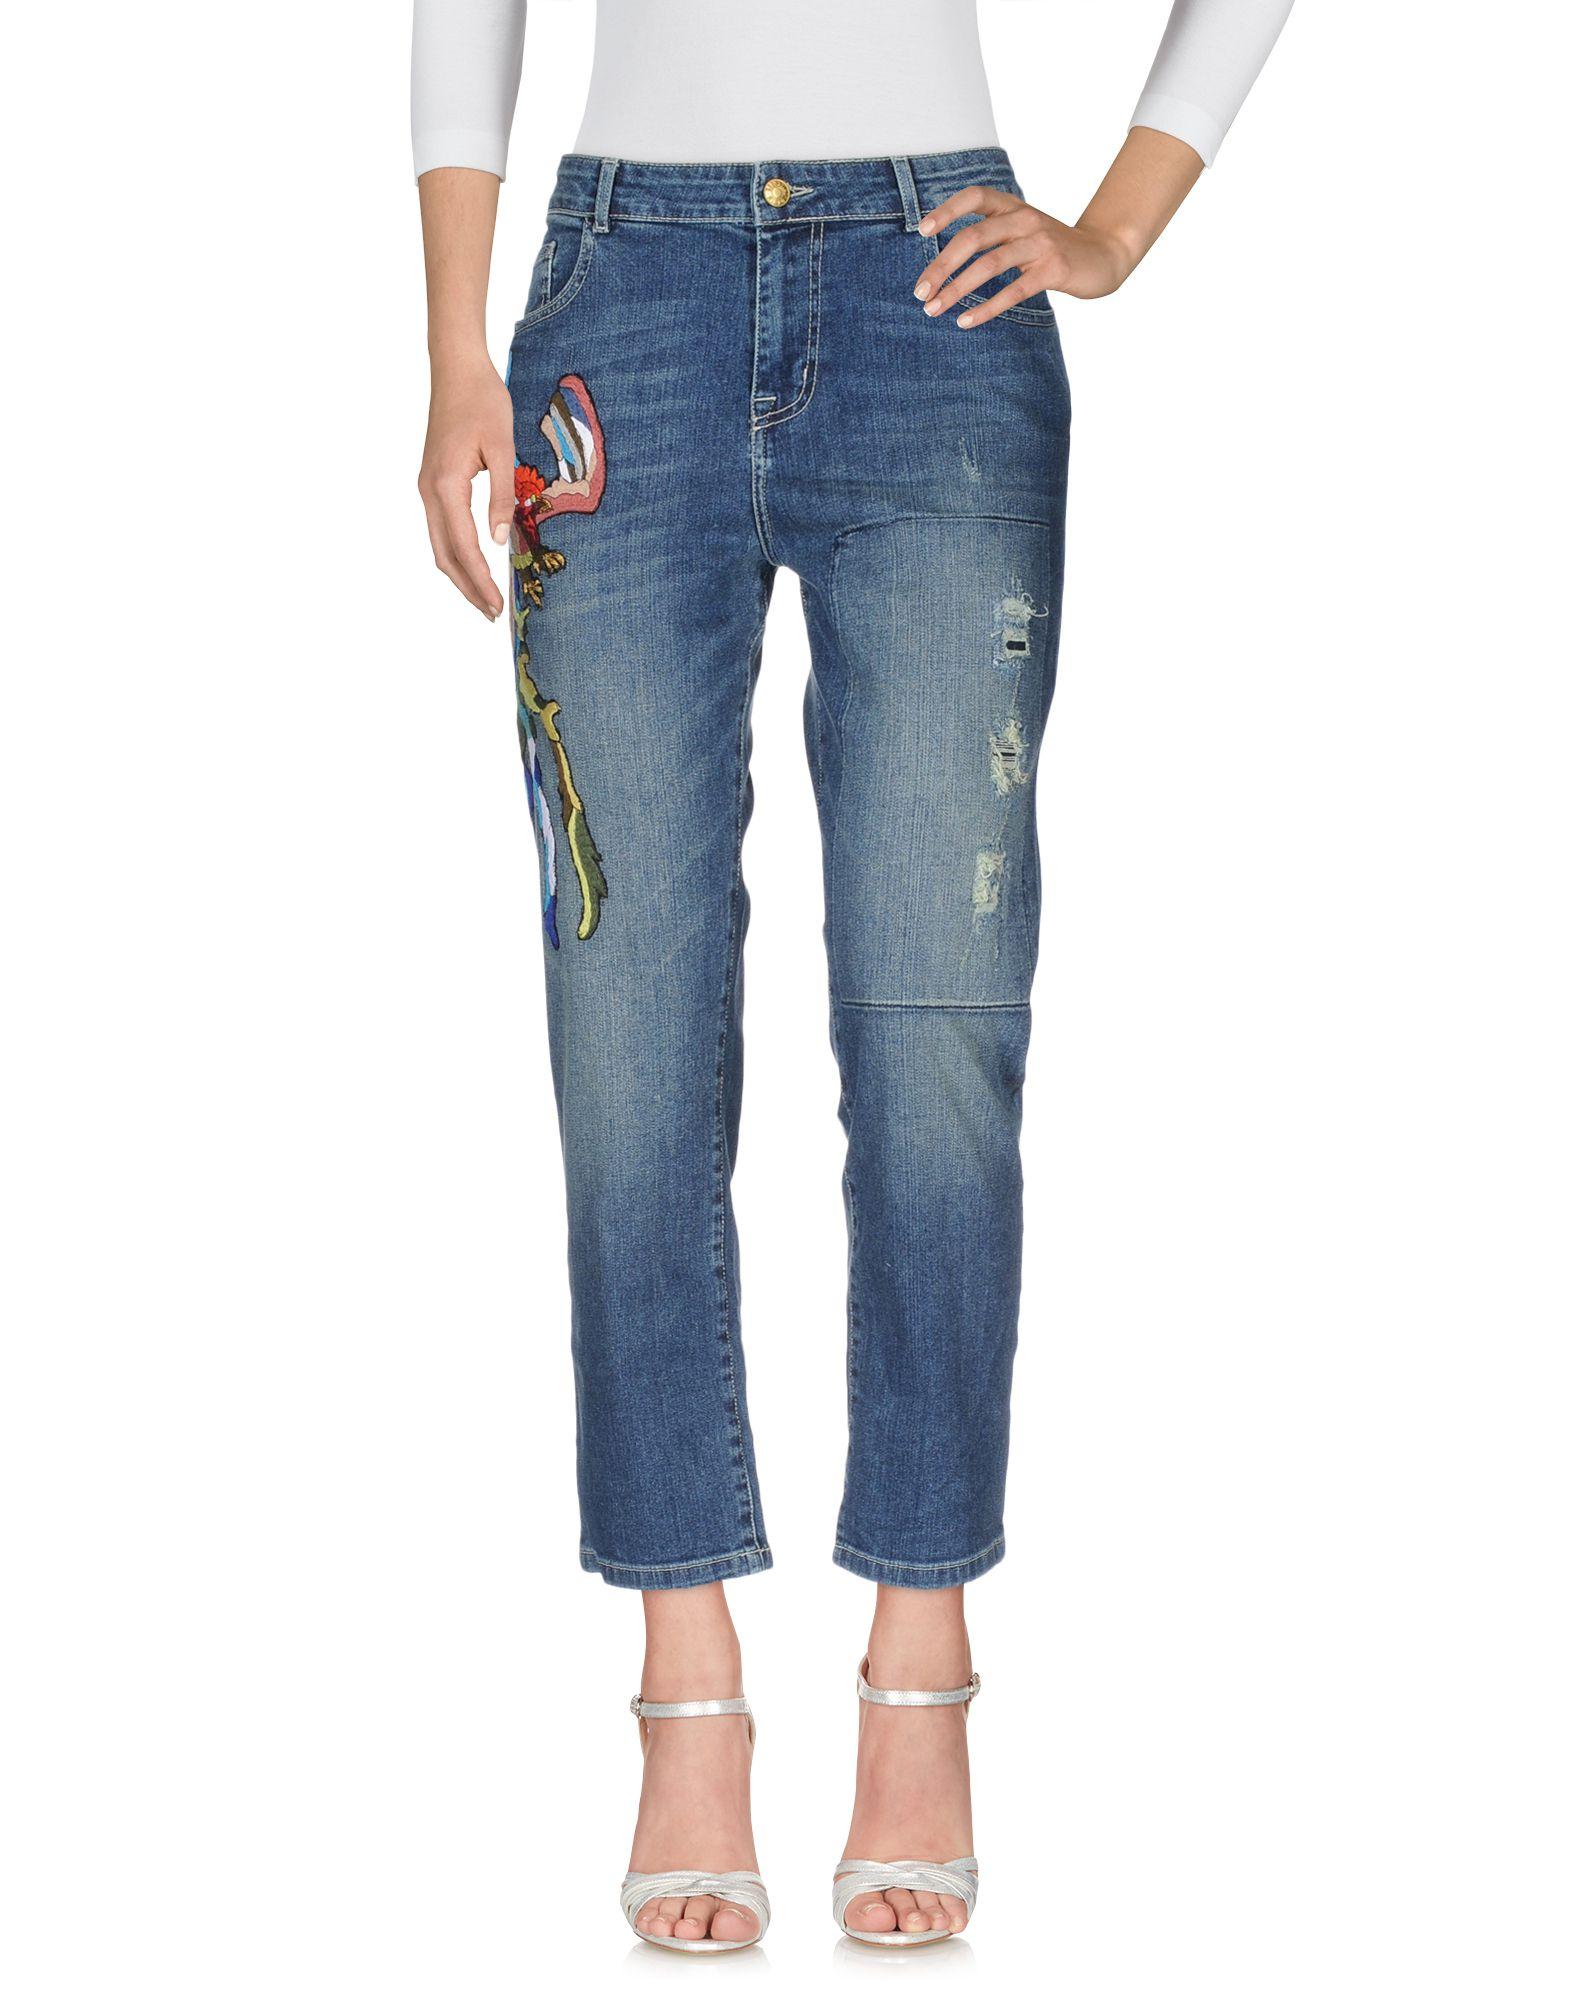 Pantaloni Jeans Essentiel Antwerp Donna - Acquista online su oAiMAu